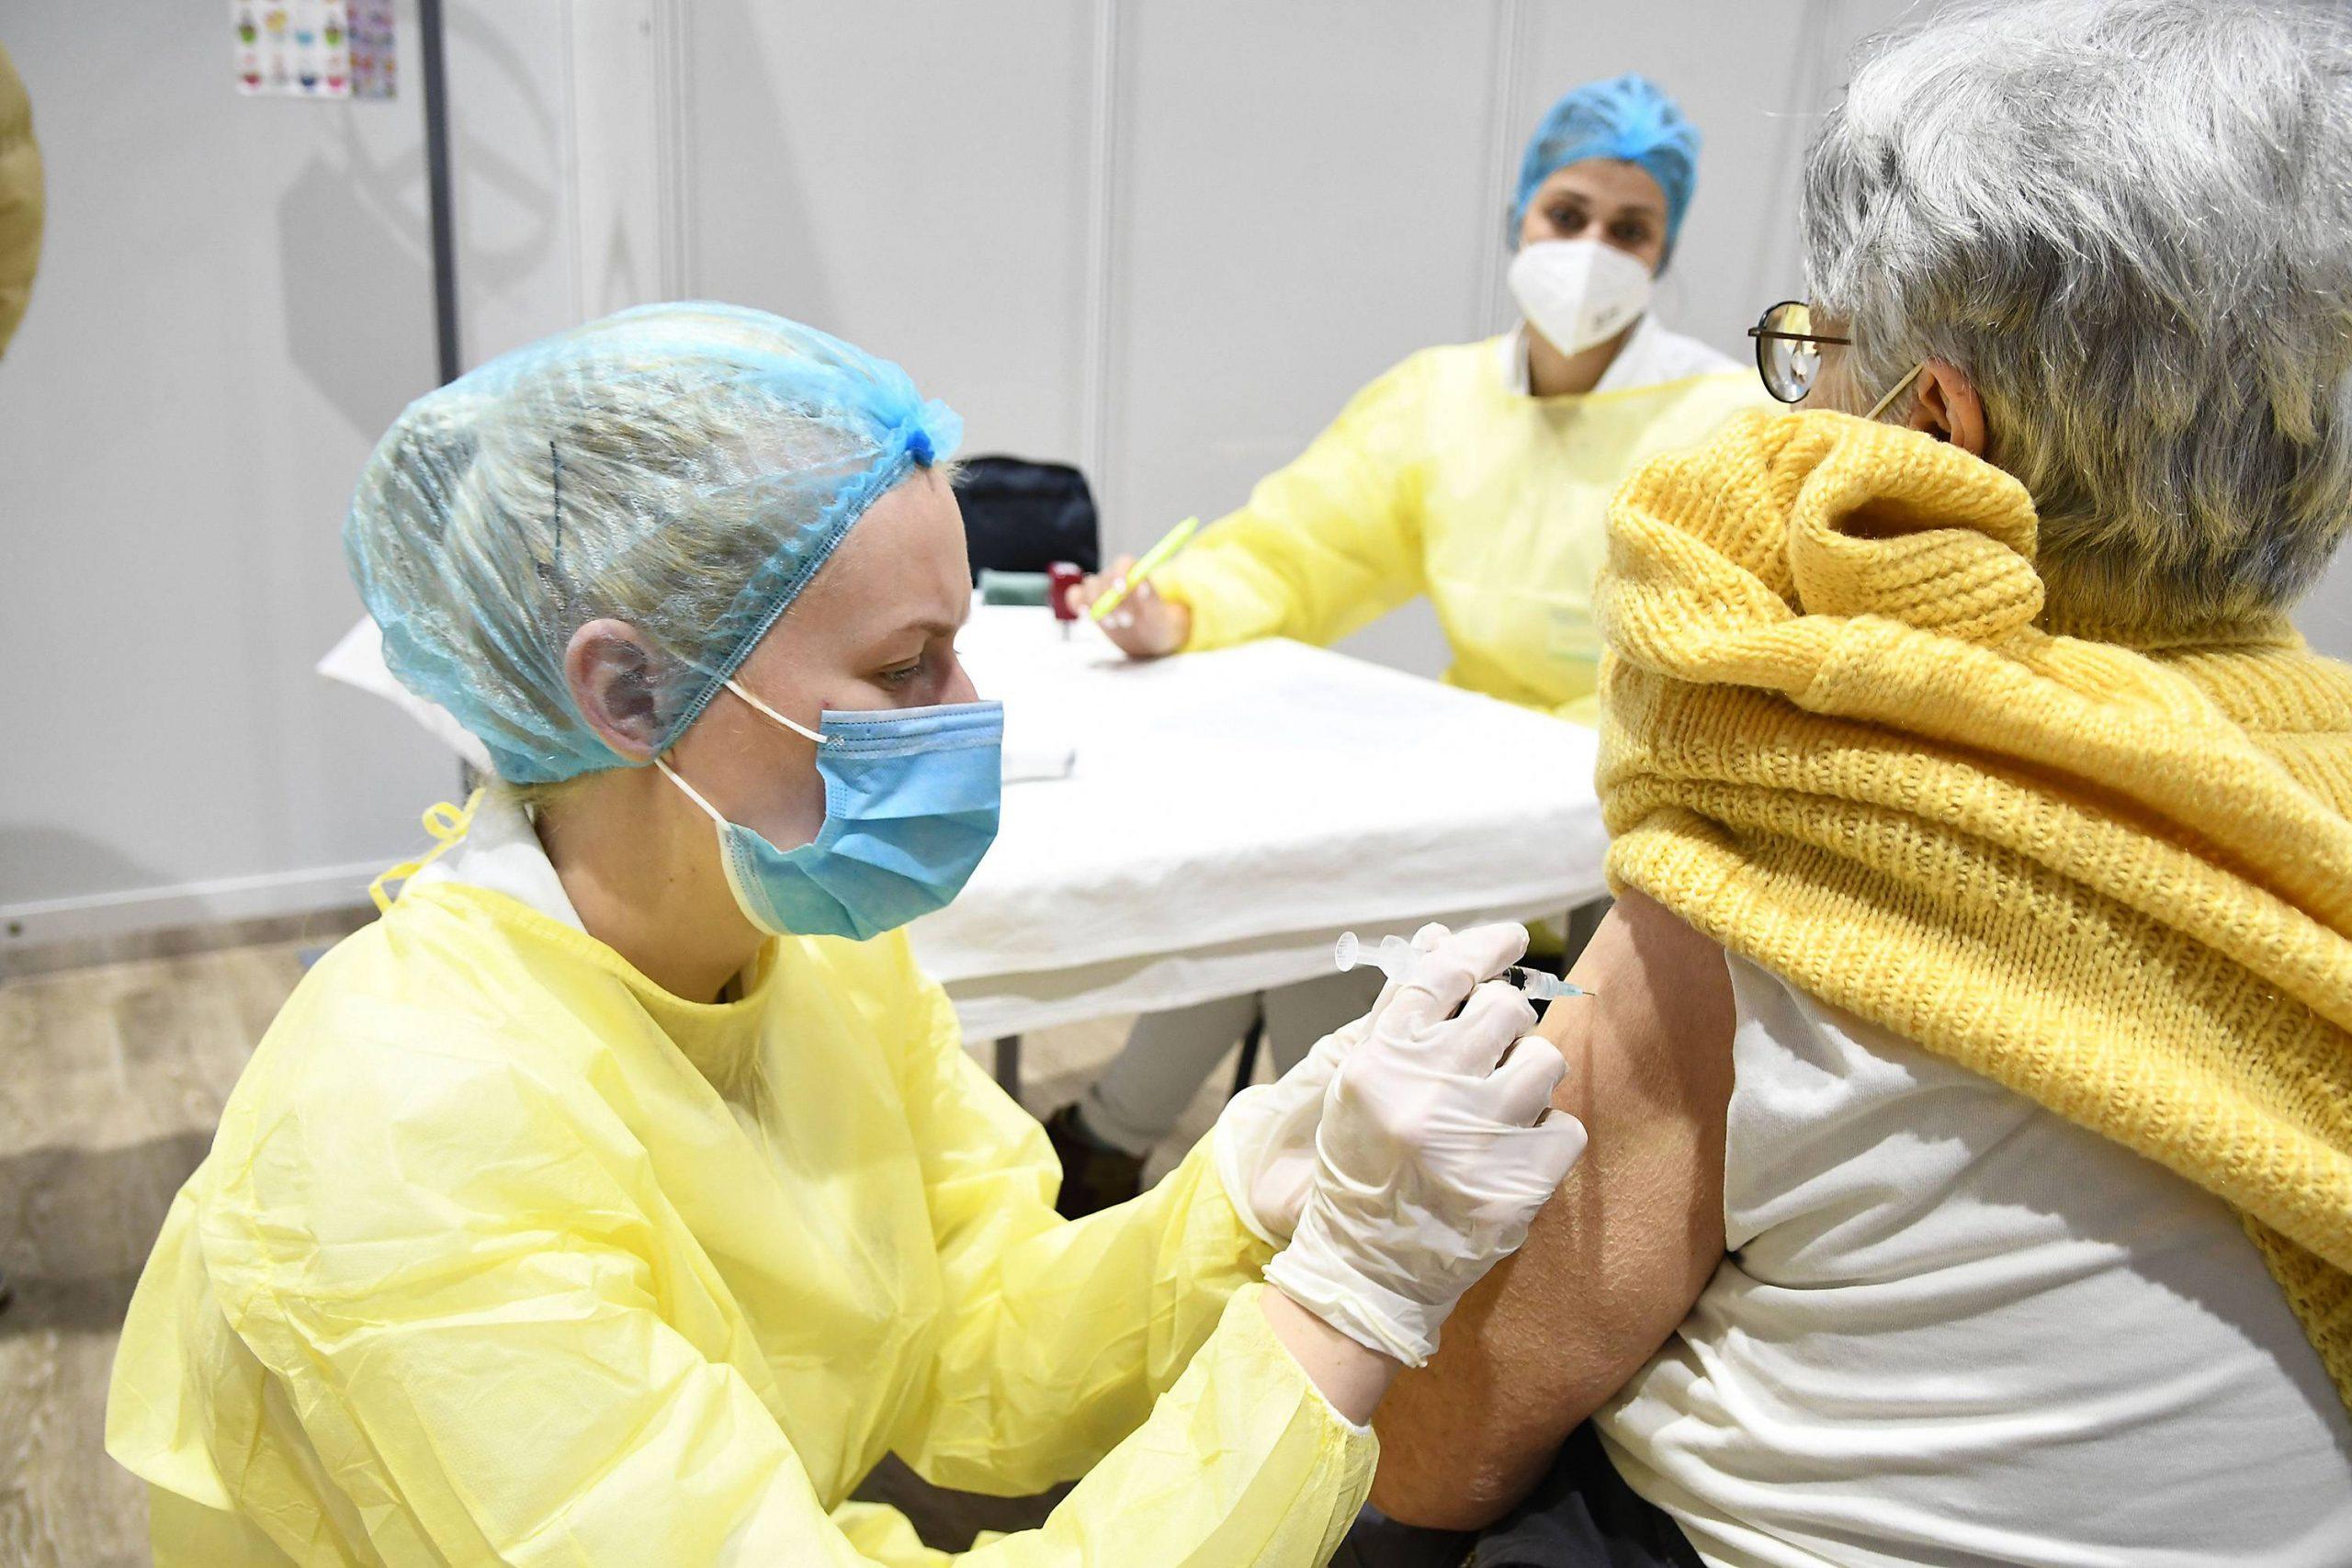 Česi vakcinisani protiv kovid-19 u Srbiji ne mogu da koriste olakšice 1